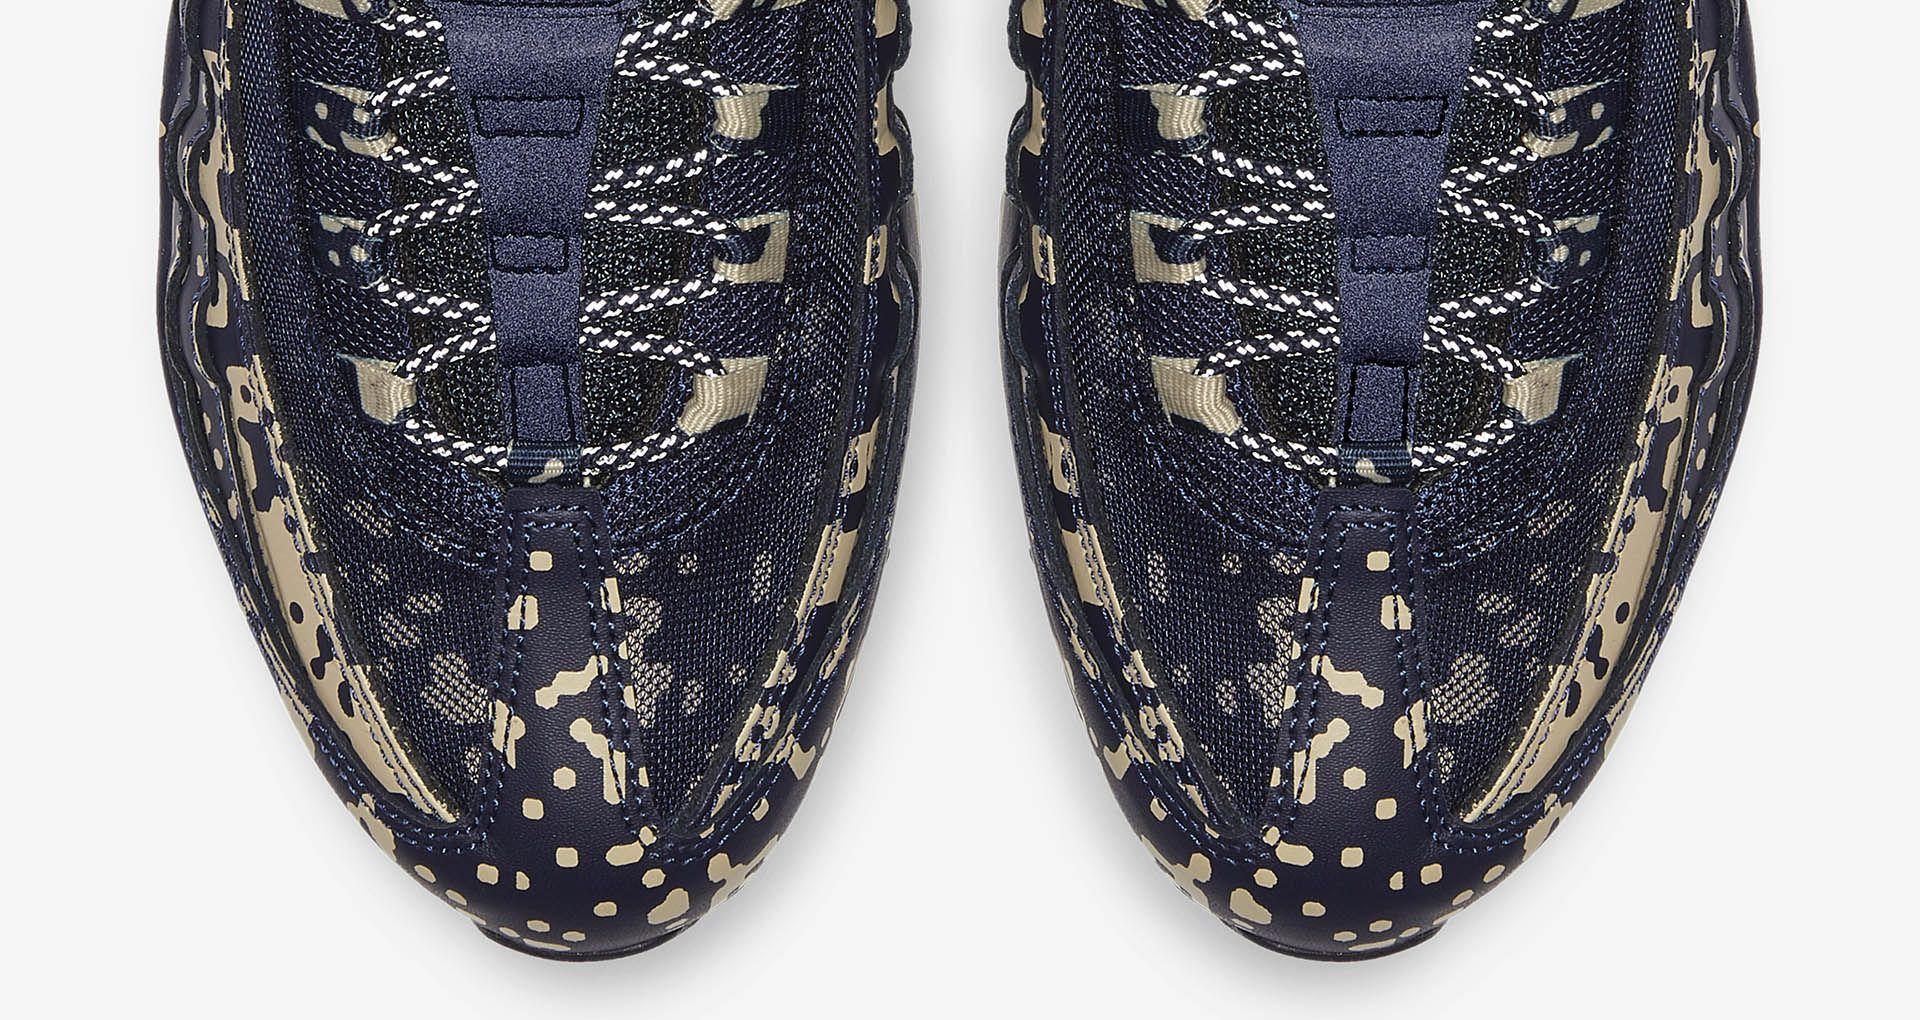 Nike Air Max 95 Cav Empt 'Blackened Blue' Release Date. Nike